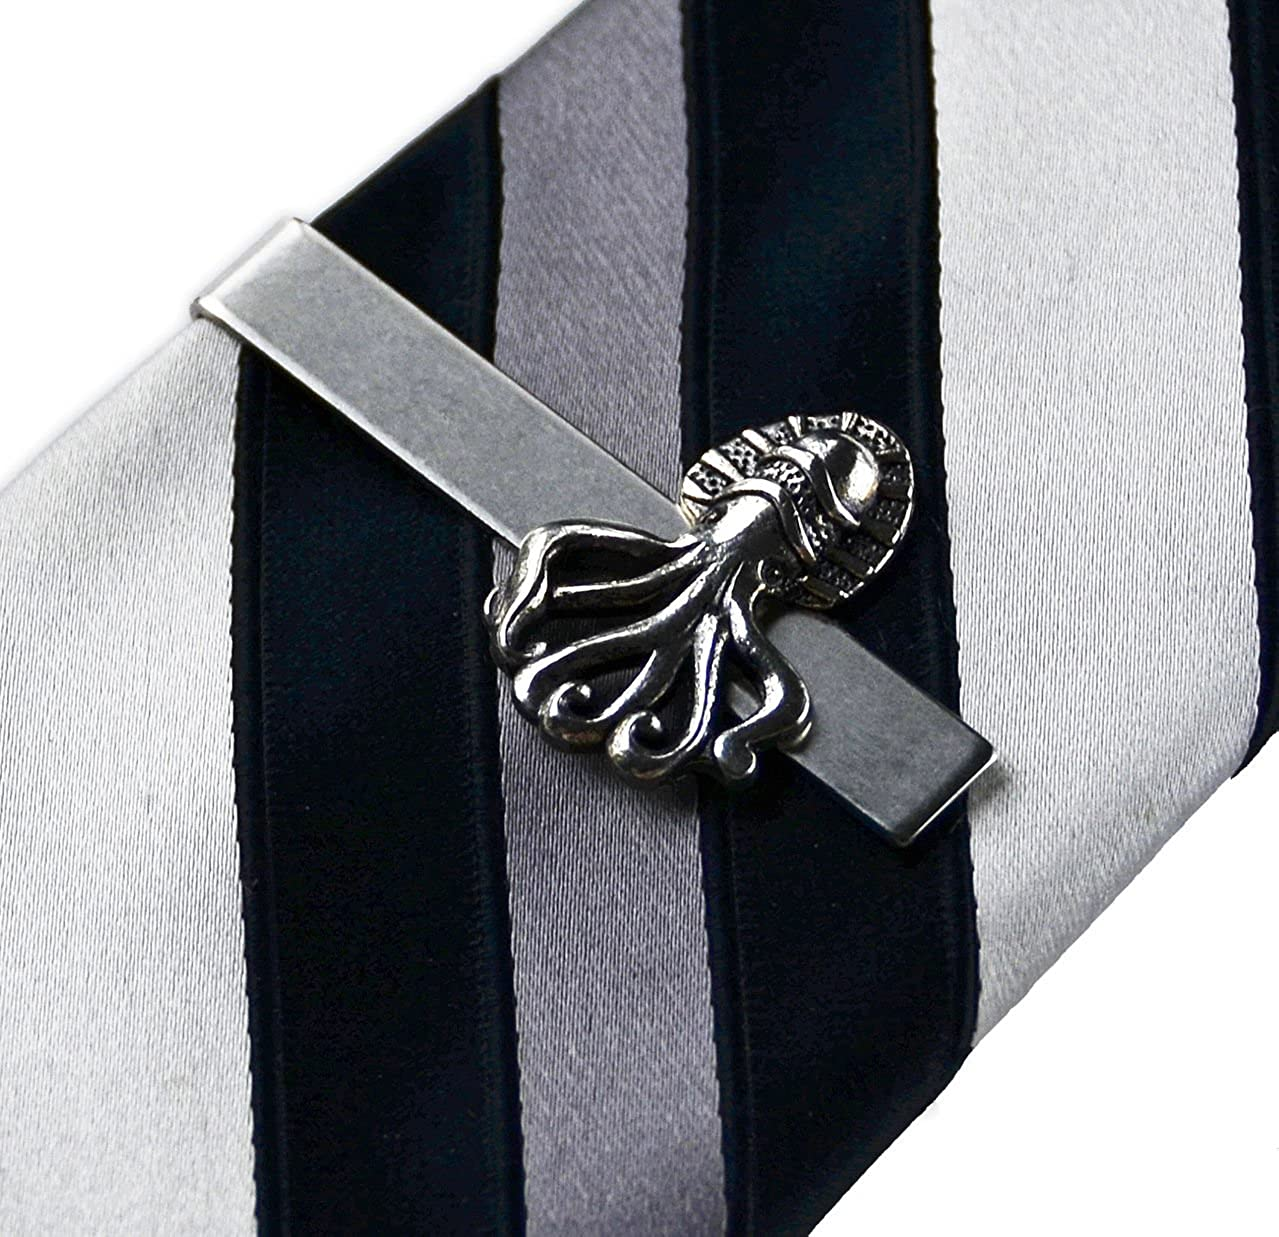 Quality Handcrafts Guaranteed Squid Tie Clip